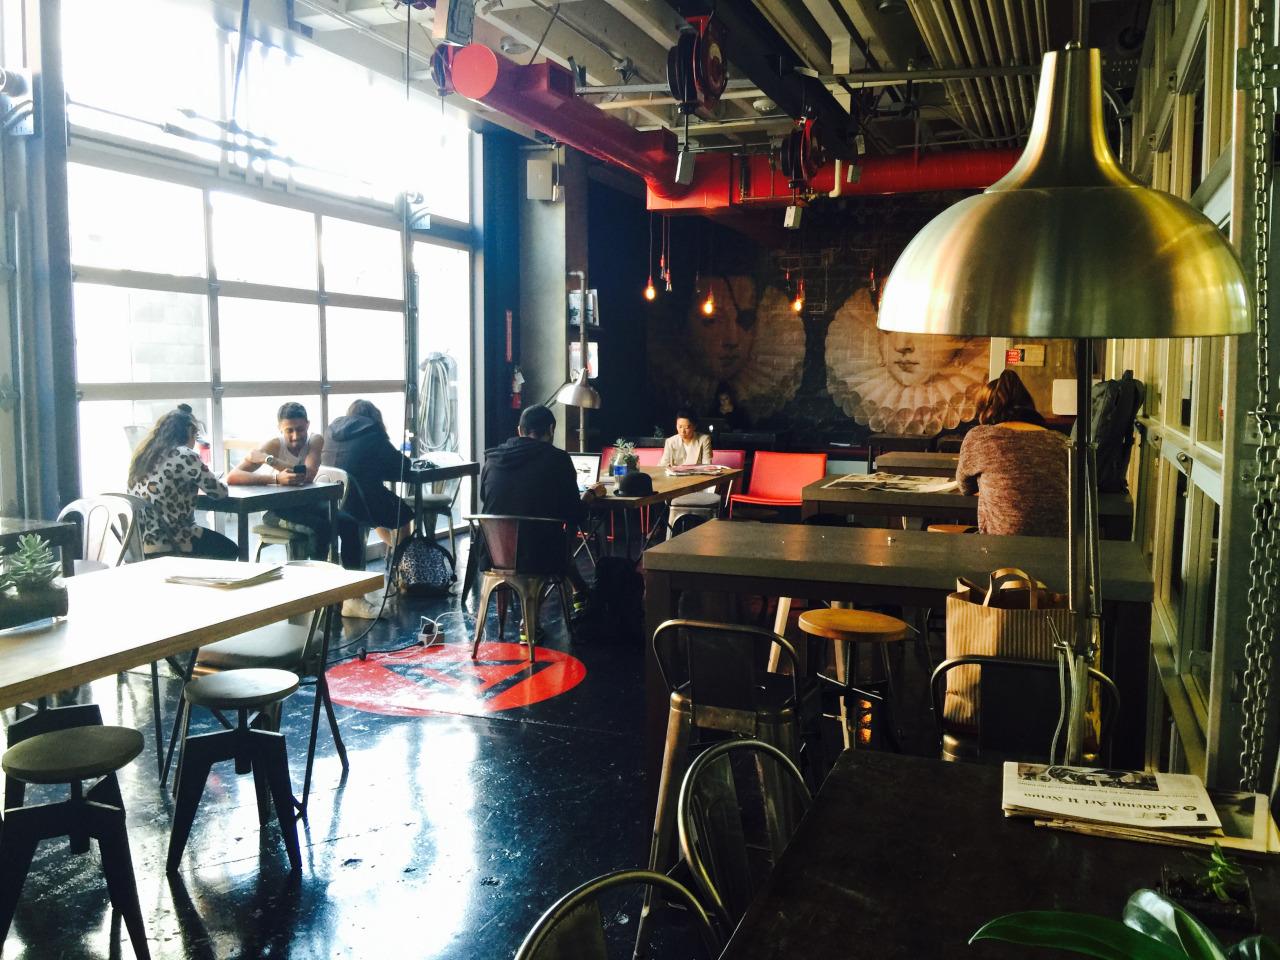 Meet Agustin Sanders Interior designer of the 601 Brannan Cafe